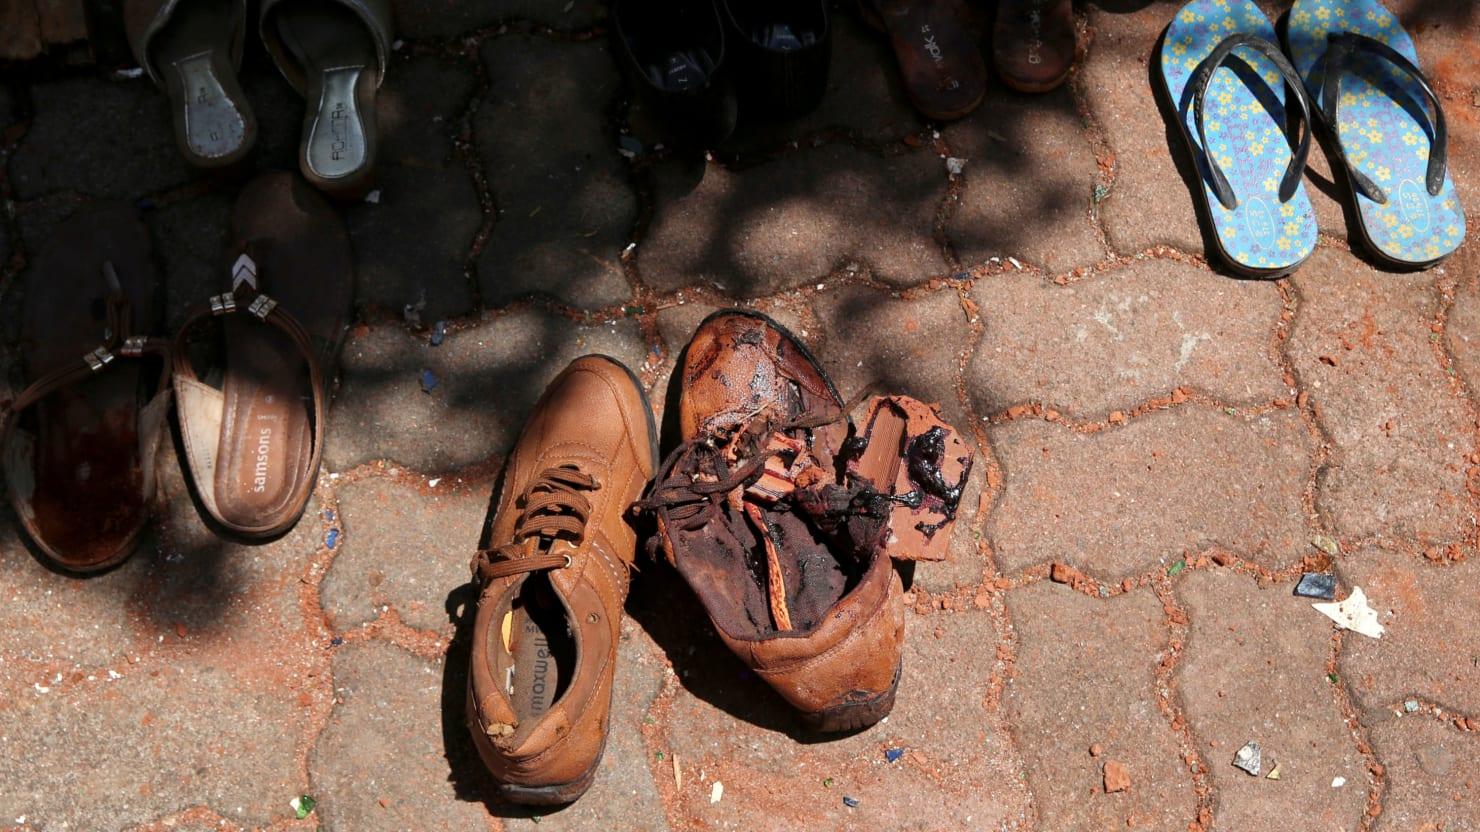 Two Americans Killed in Sri Lanka Bombings Are Identified